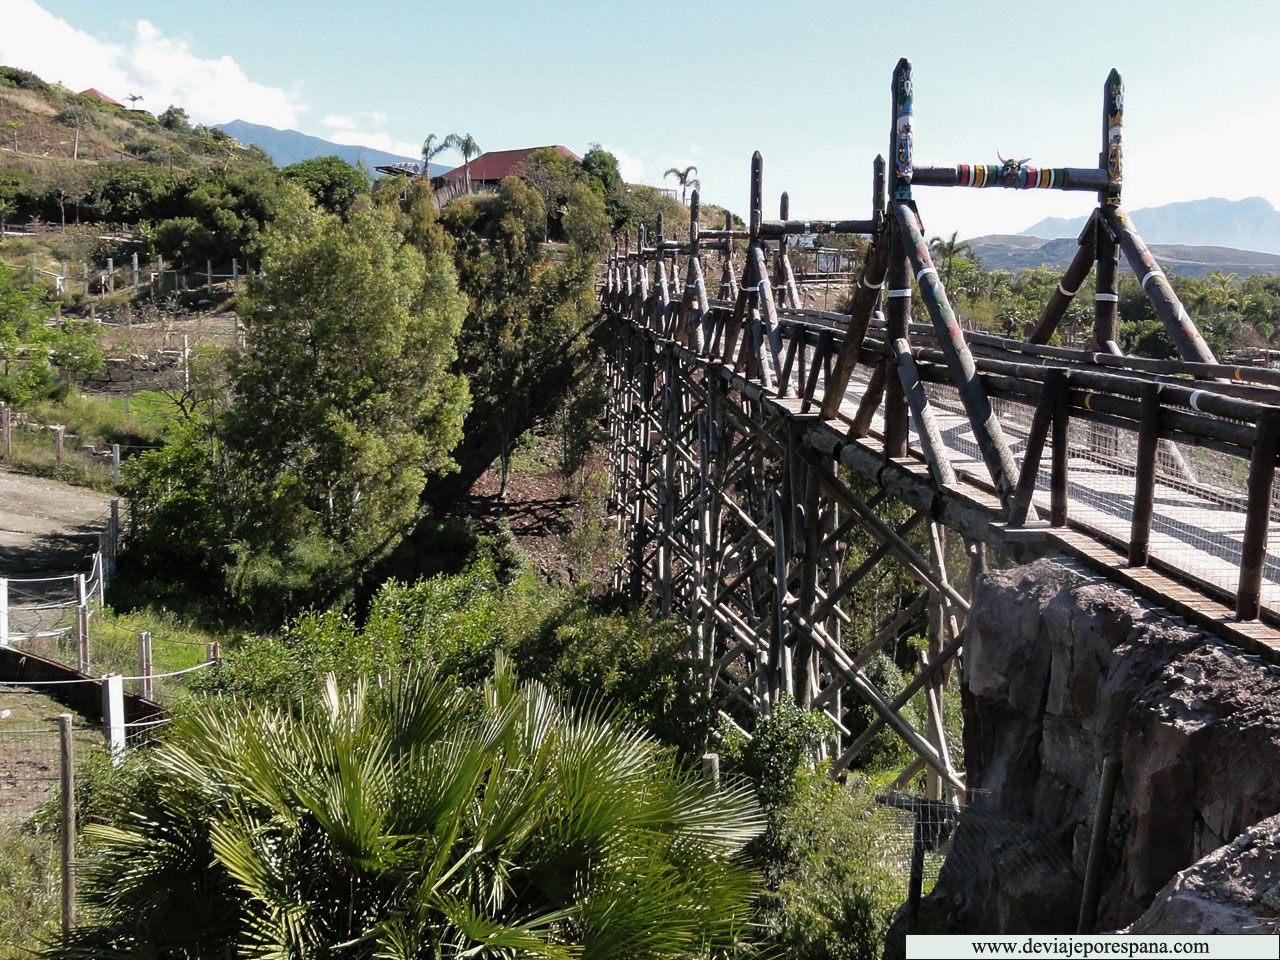 Selwo-Estepona safari theme park